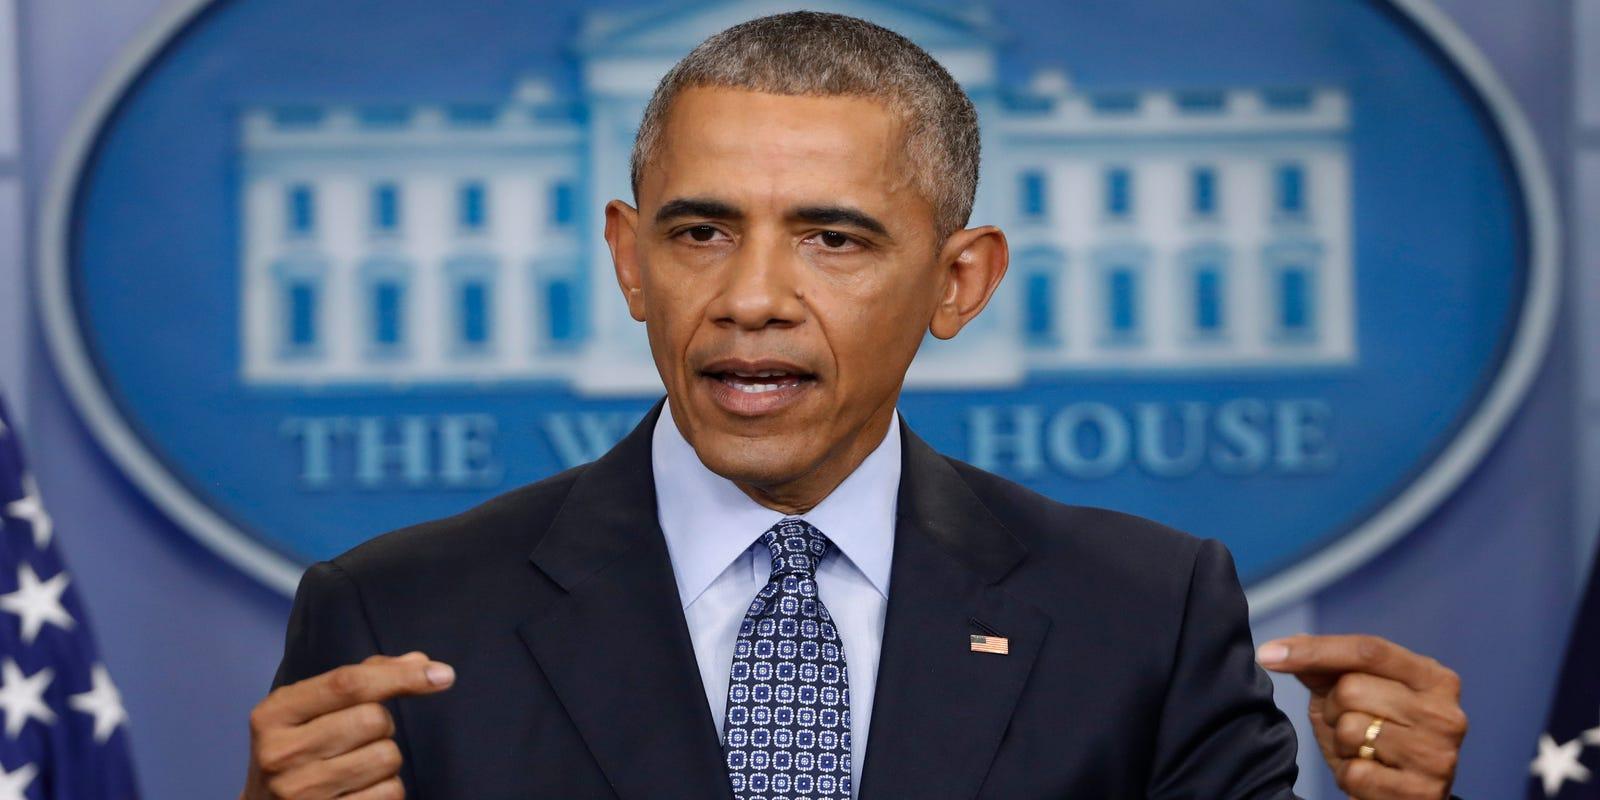 Obama college papers sealed sample resume restaurant manager fine dining